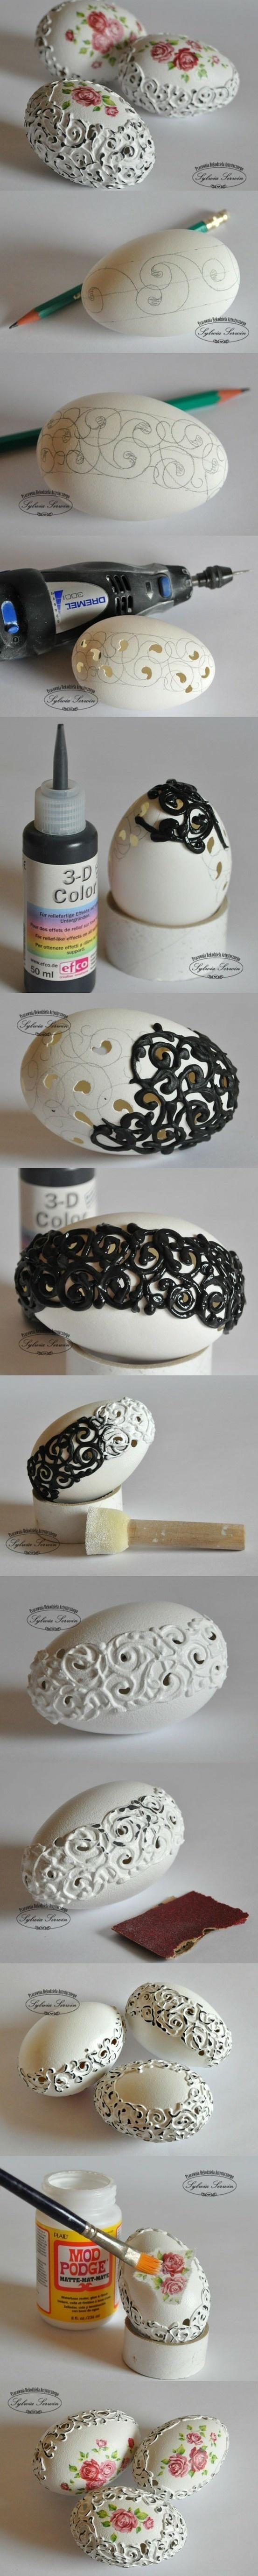 Ovos decorados/ Decorated eggs